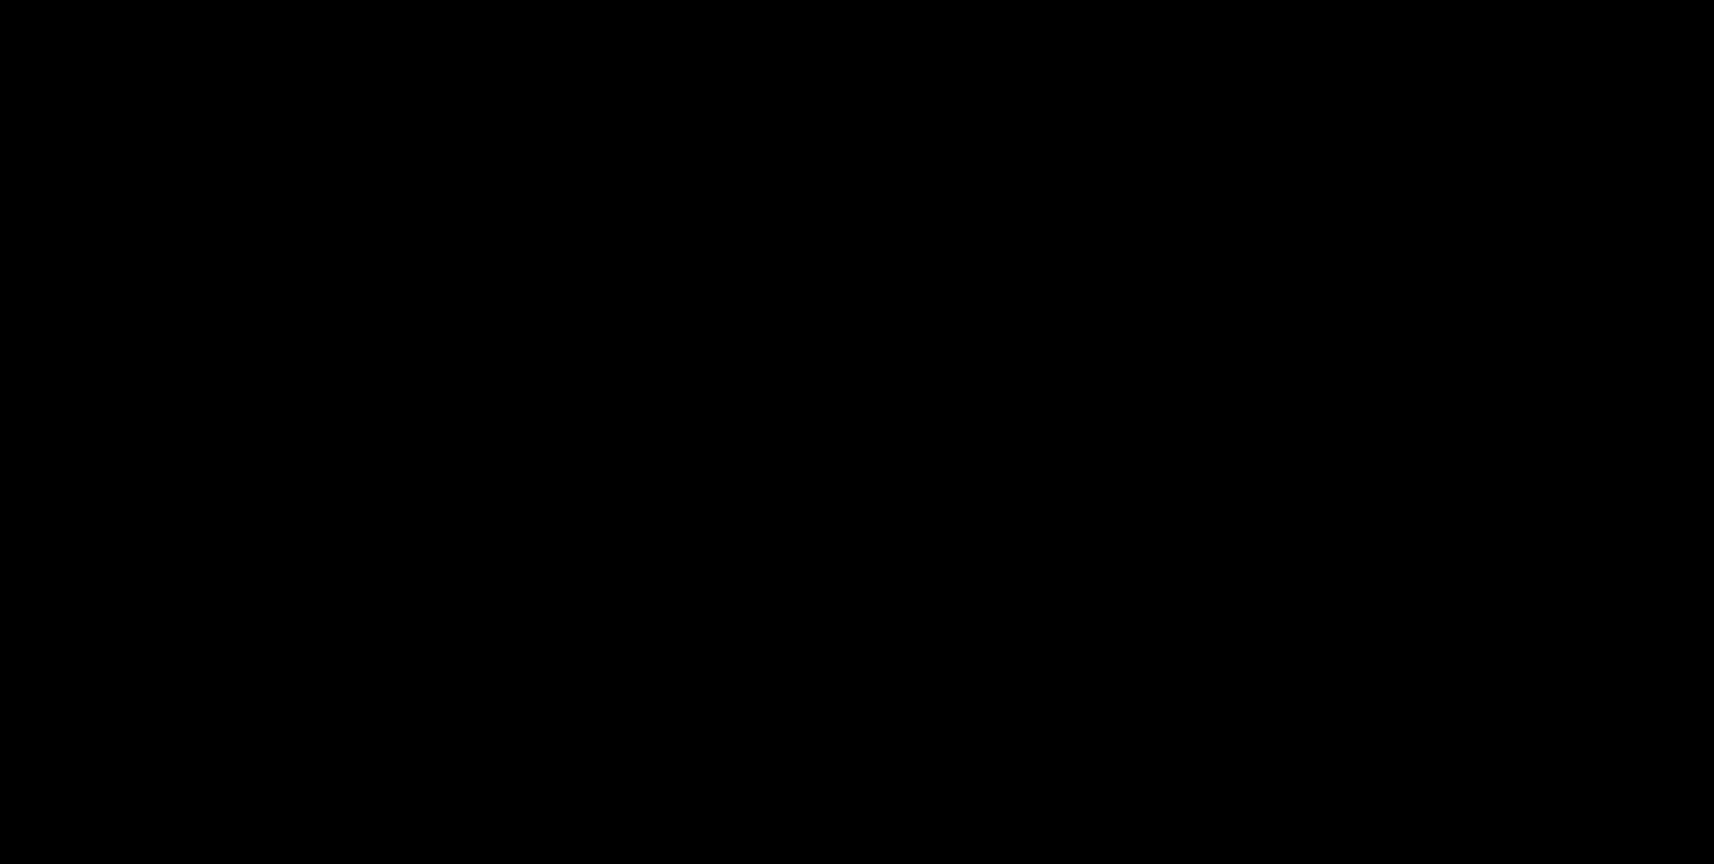 feweb-member-logo_black